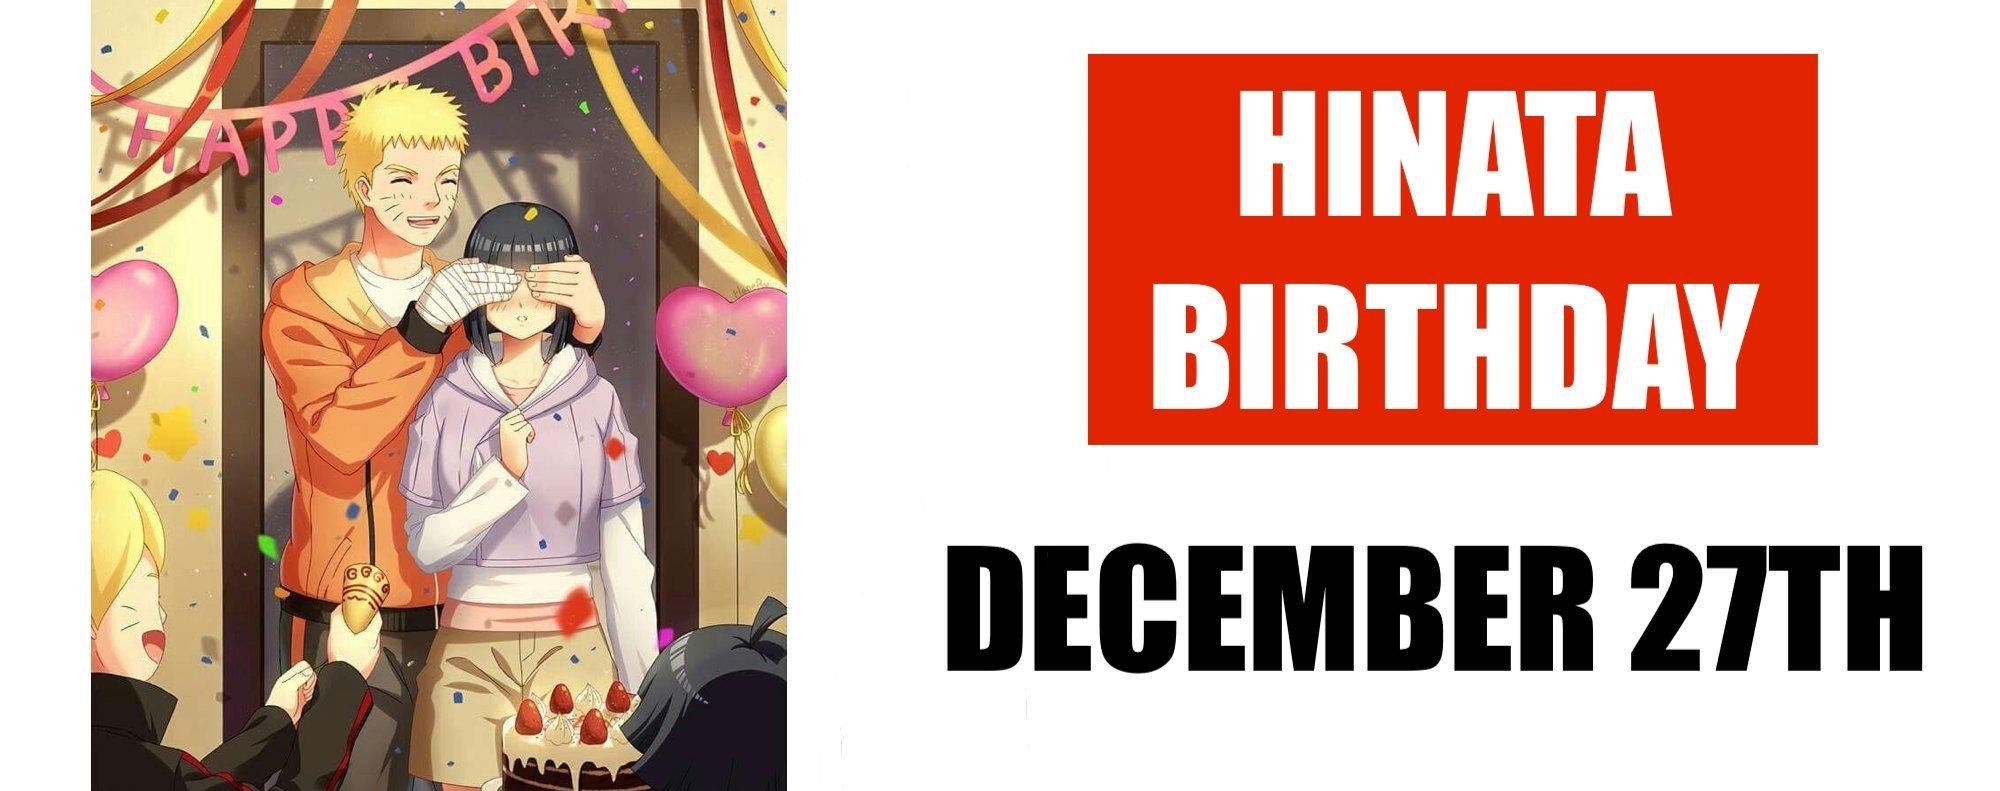 When is Hinata's Birthday